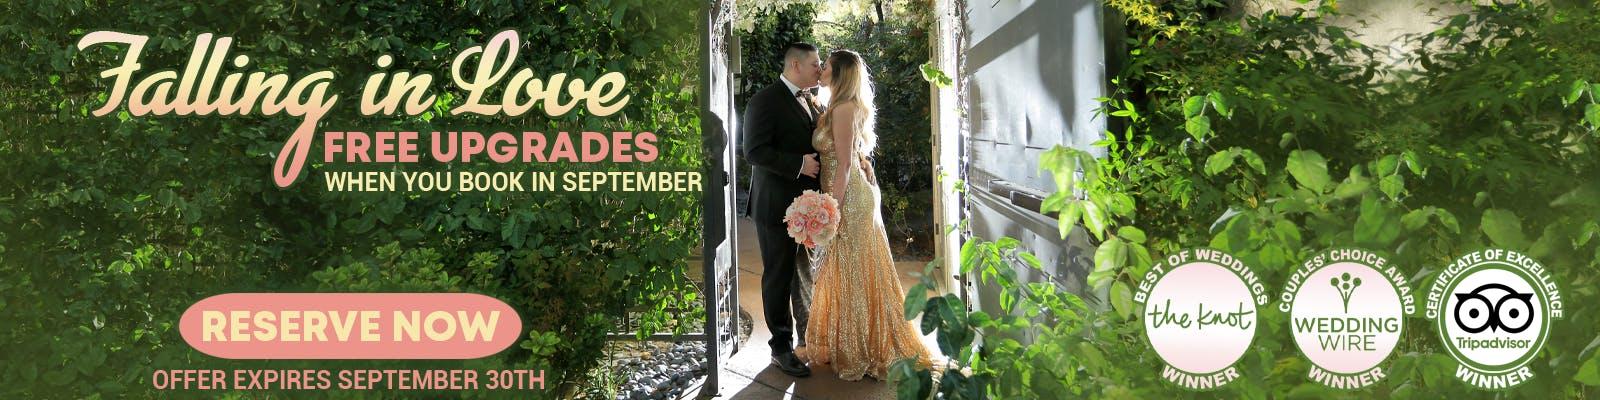 Vegas Weddings Specials